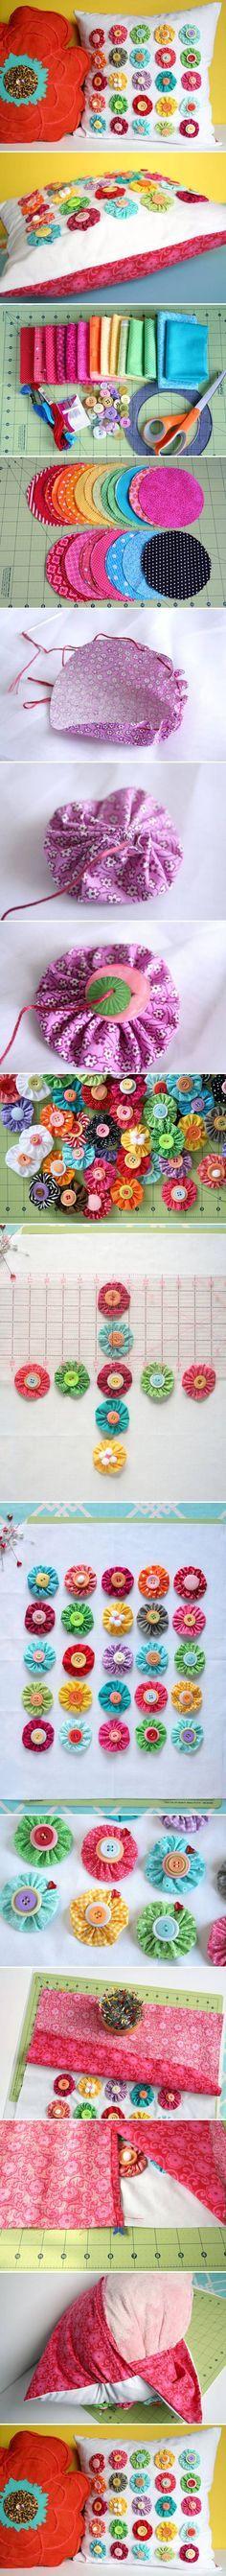 DIY Fabric Decorative Flowers DIY Fabric Decorative Flowers